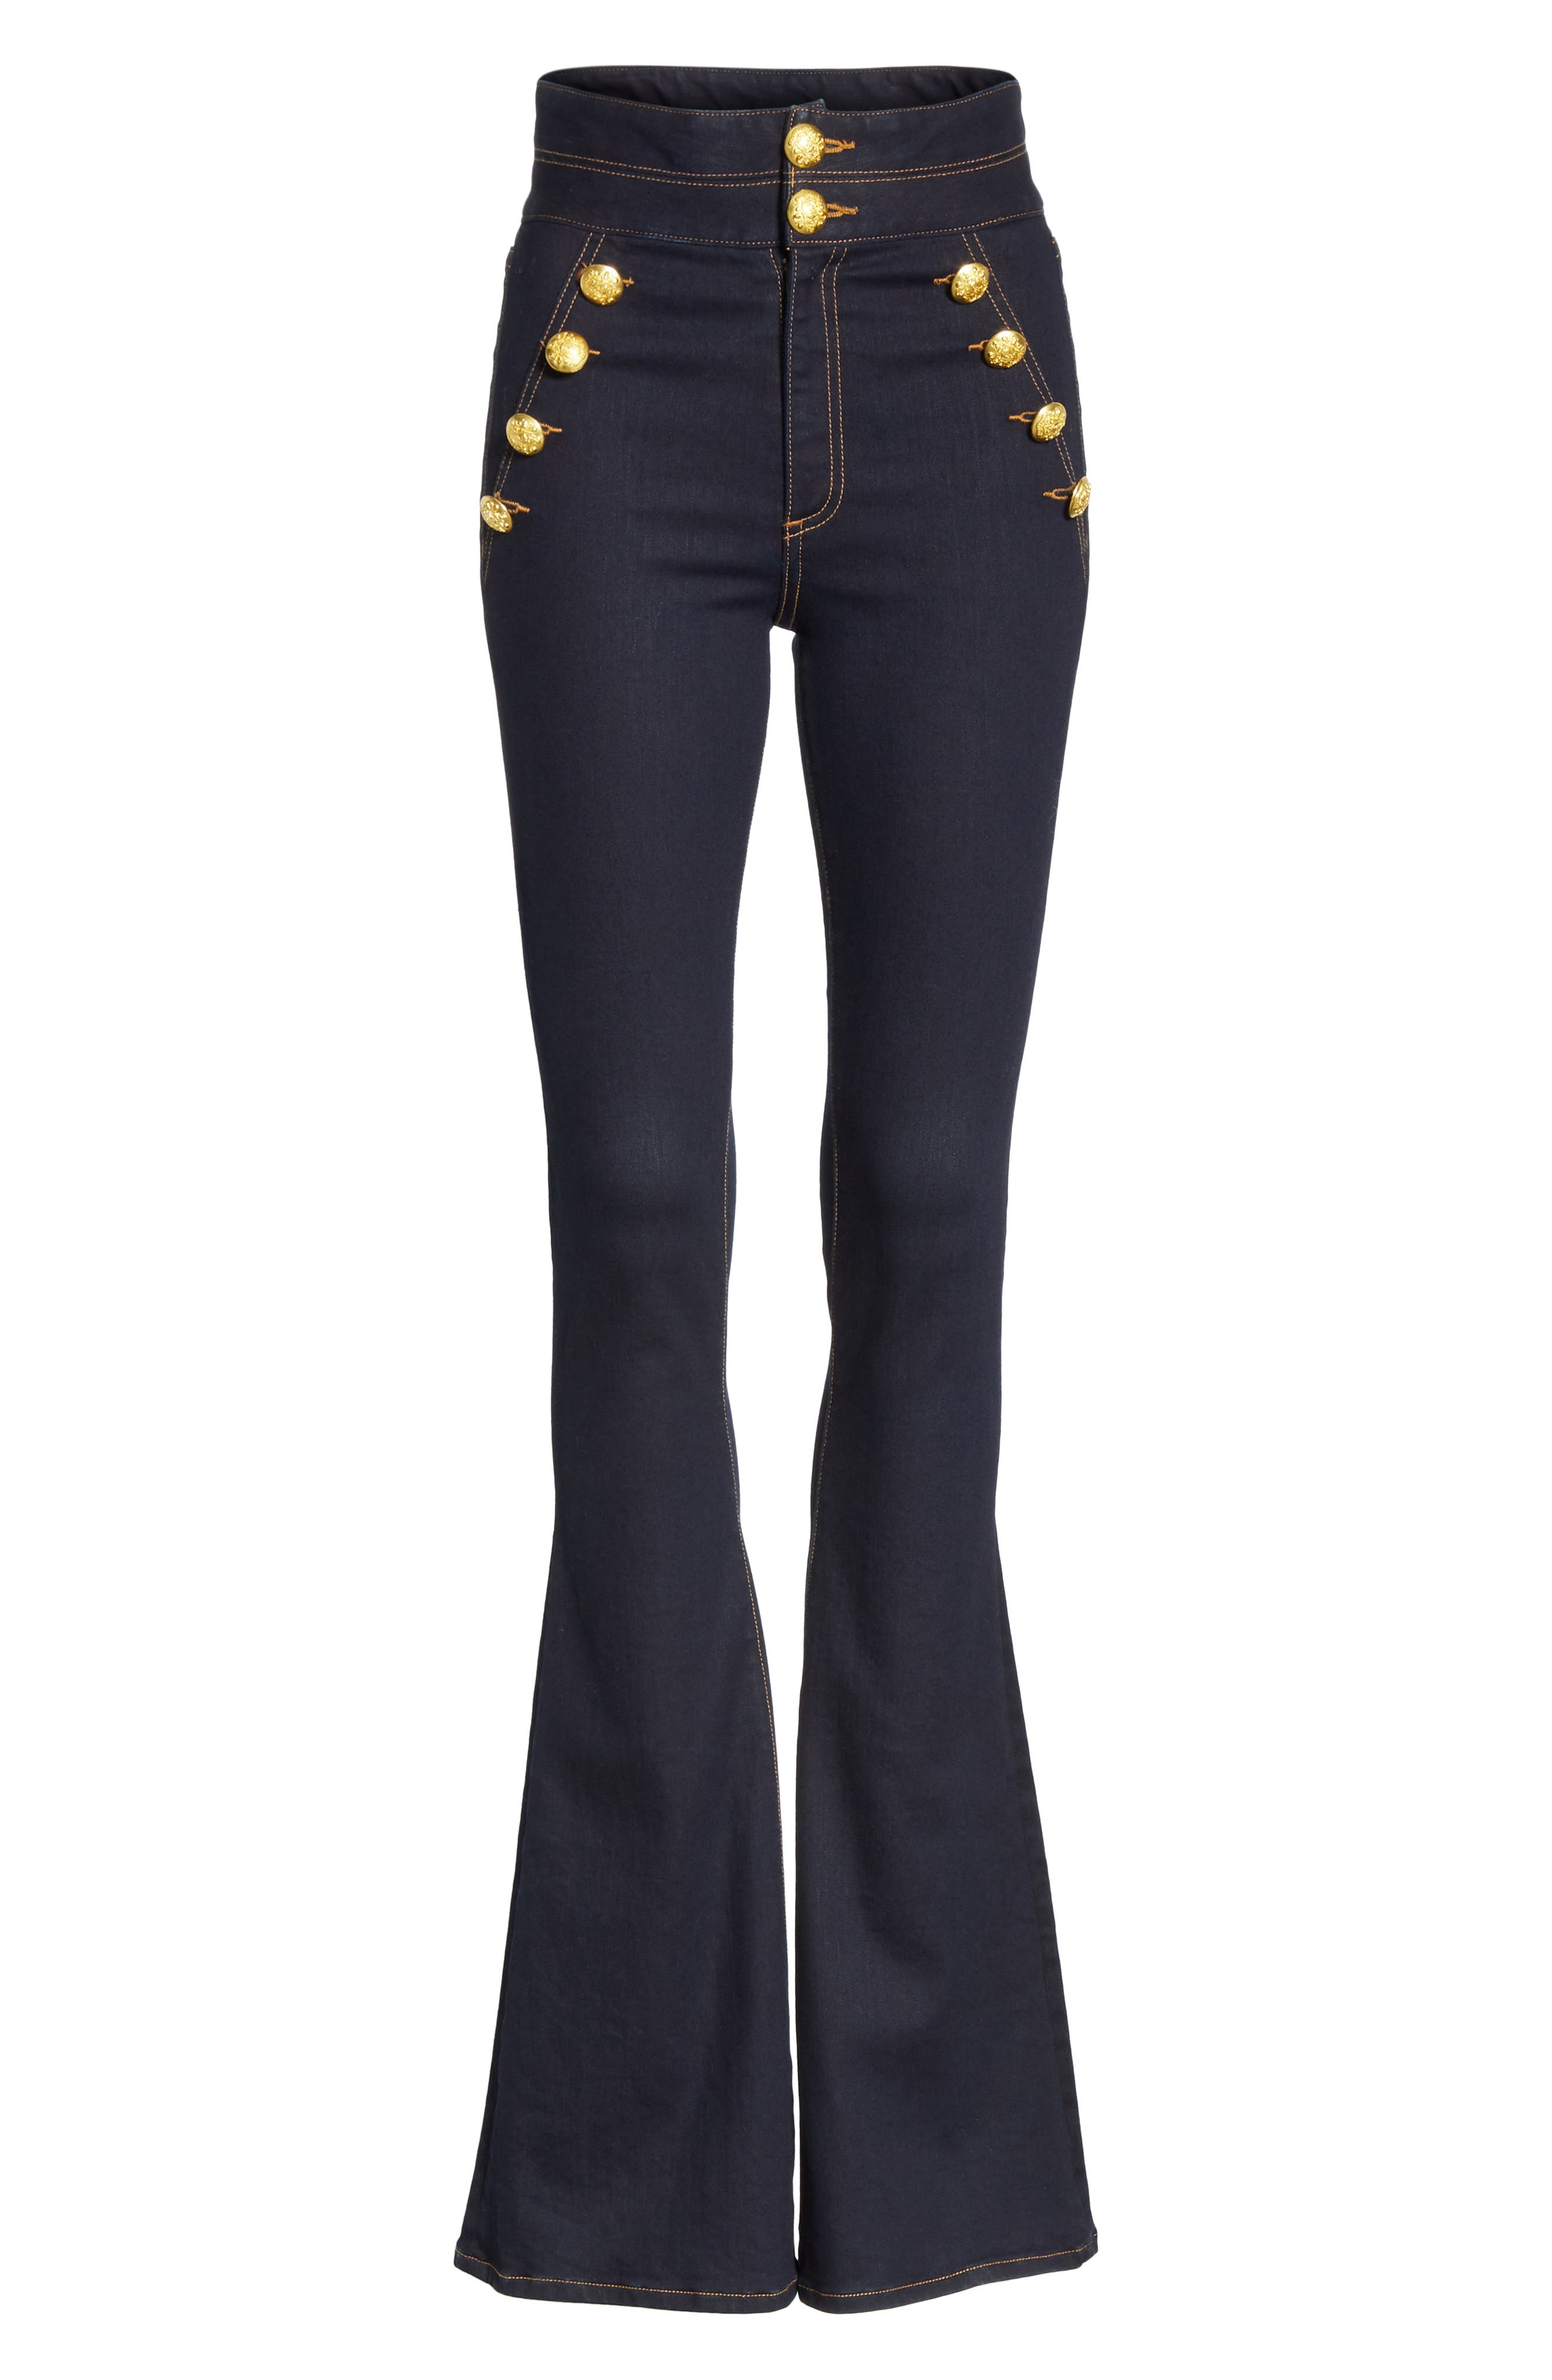 VERONICA BEARD, Dalida Button Detail Skinny Flare Jeans, Alternate thumbnail 6, color, INDIGO